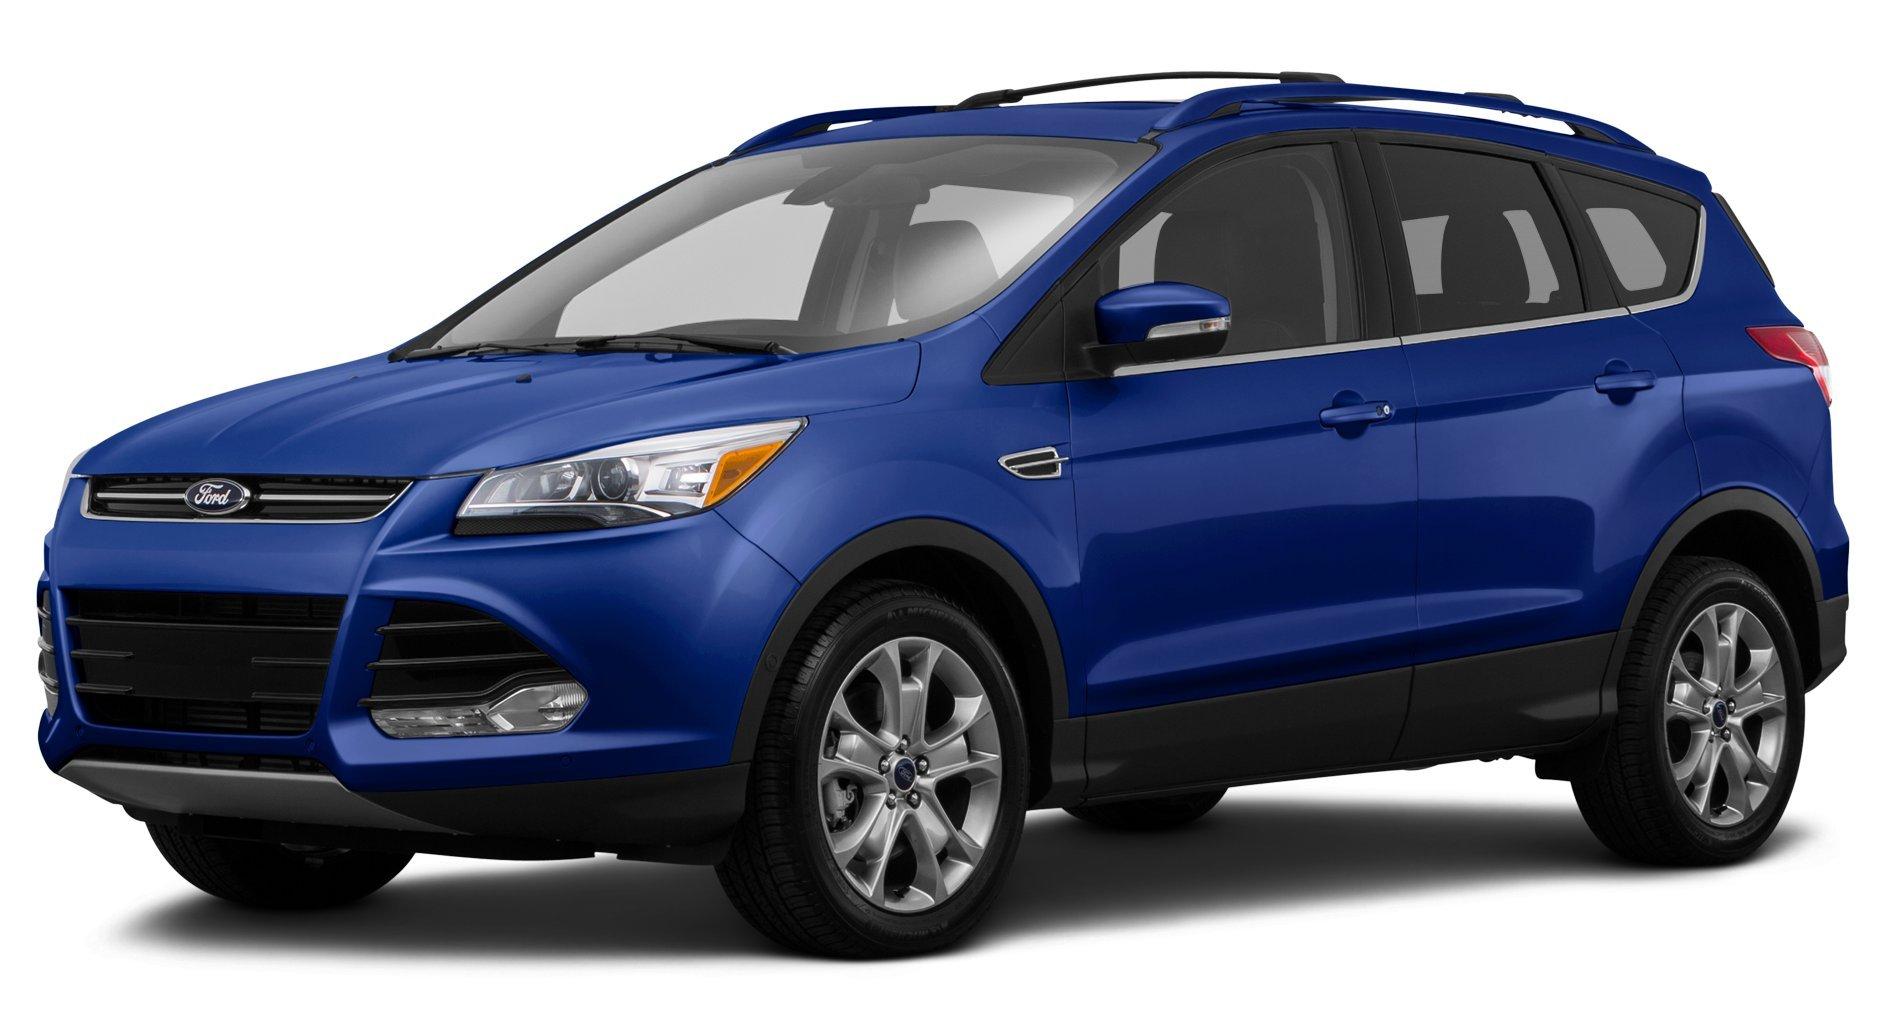 ... 2015 Ford Escape Titanium, 4-Wheel Drive 4-Door. 2015 Jeep Grand  Cherokee ...